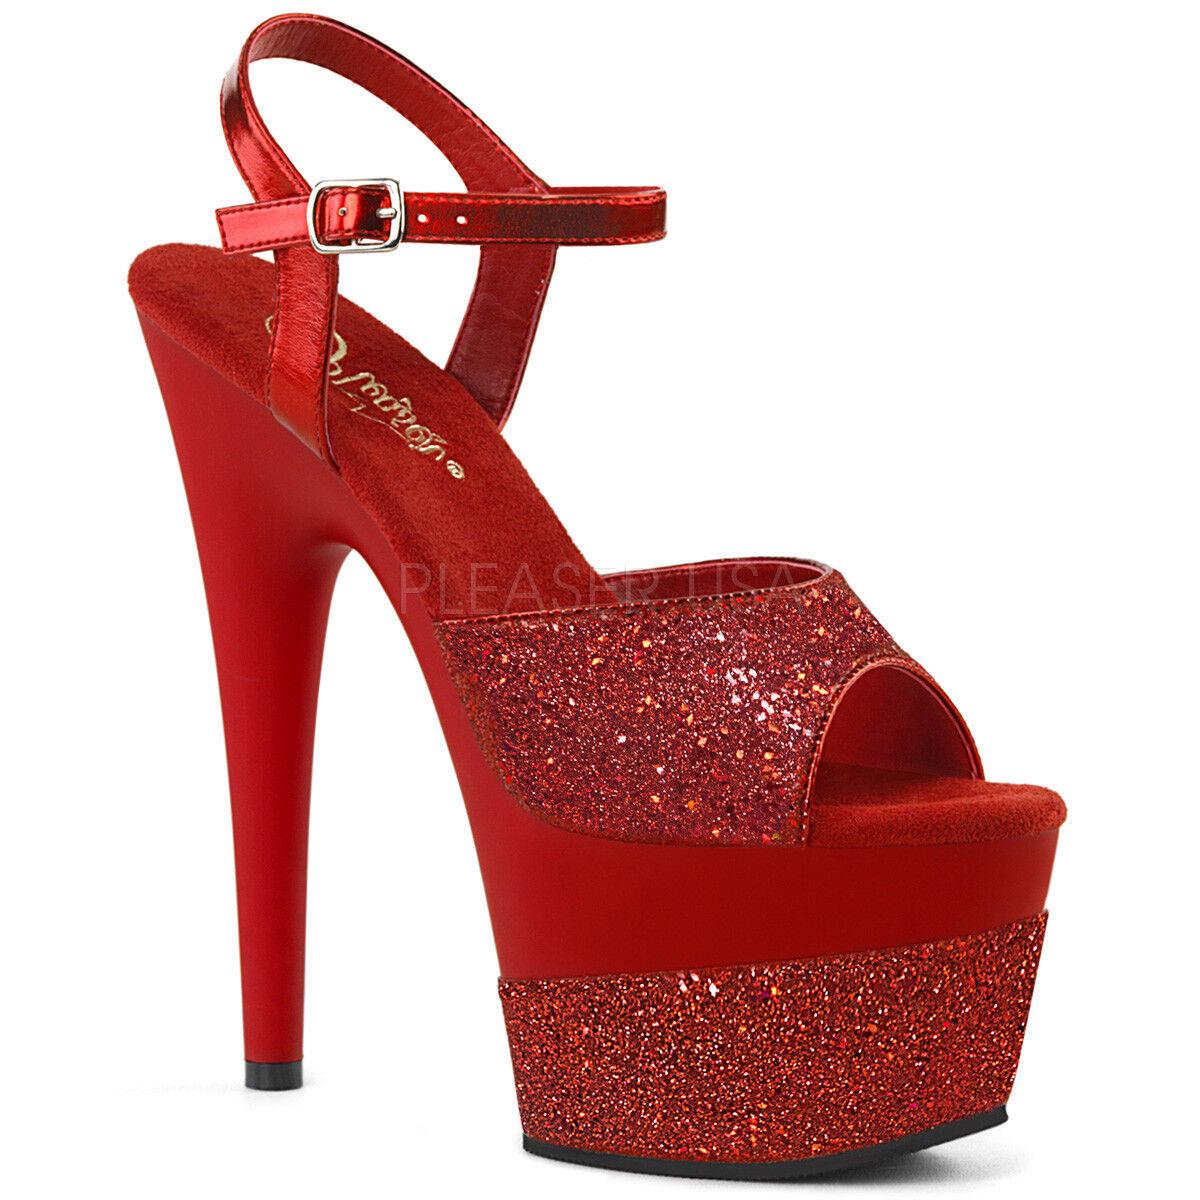 PLEASER ADORE-709-2G 7  Heel rot Glitter Platform Stripper Ankle Ankle Ankle Strap schuhe 011137